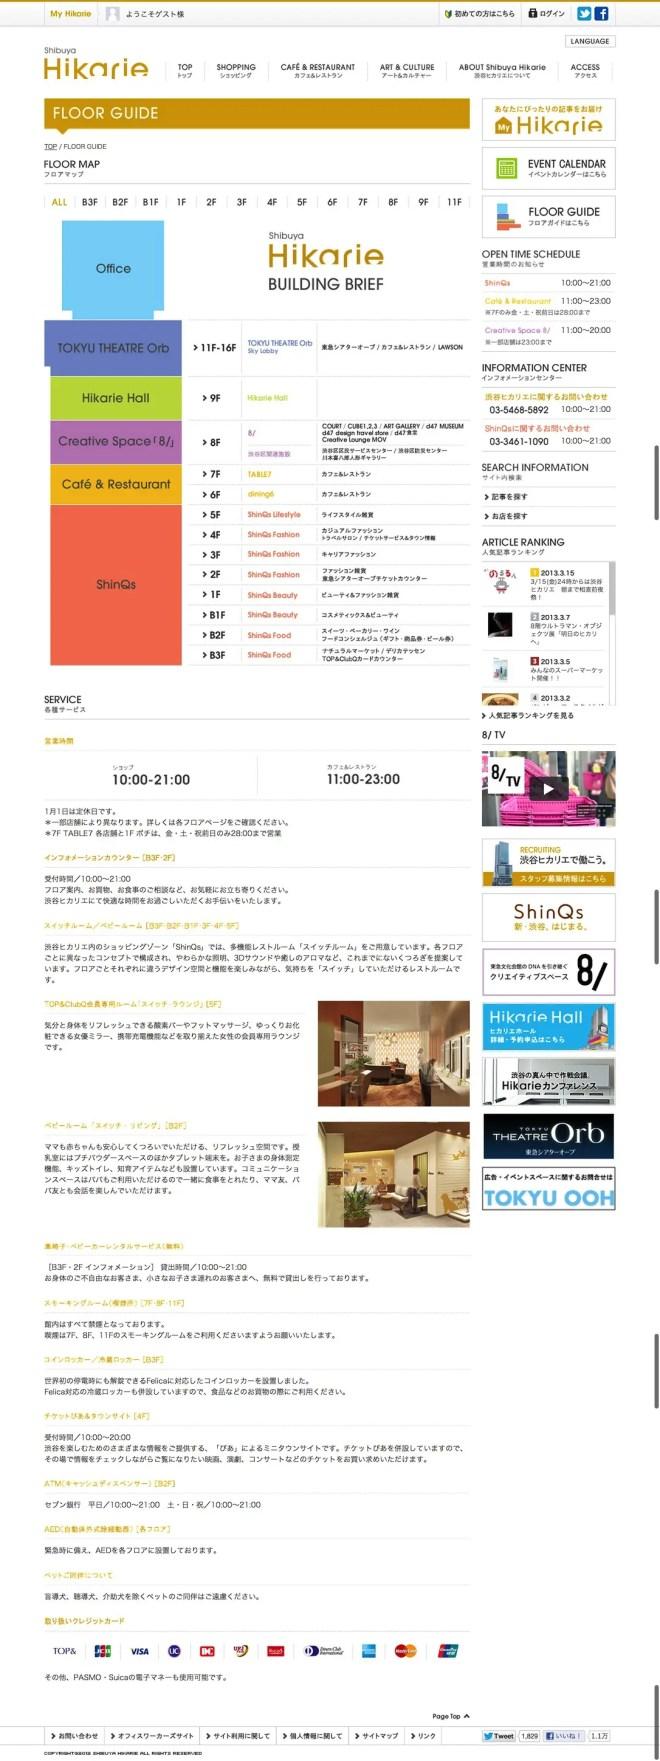 WEBサイトデザインまとめ | フロアガイド編